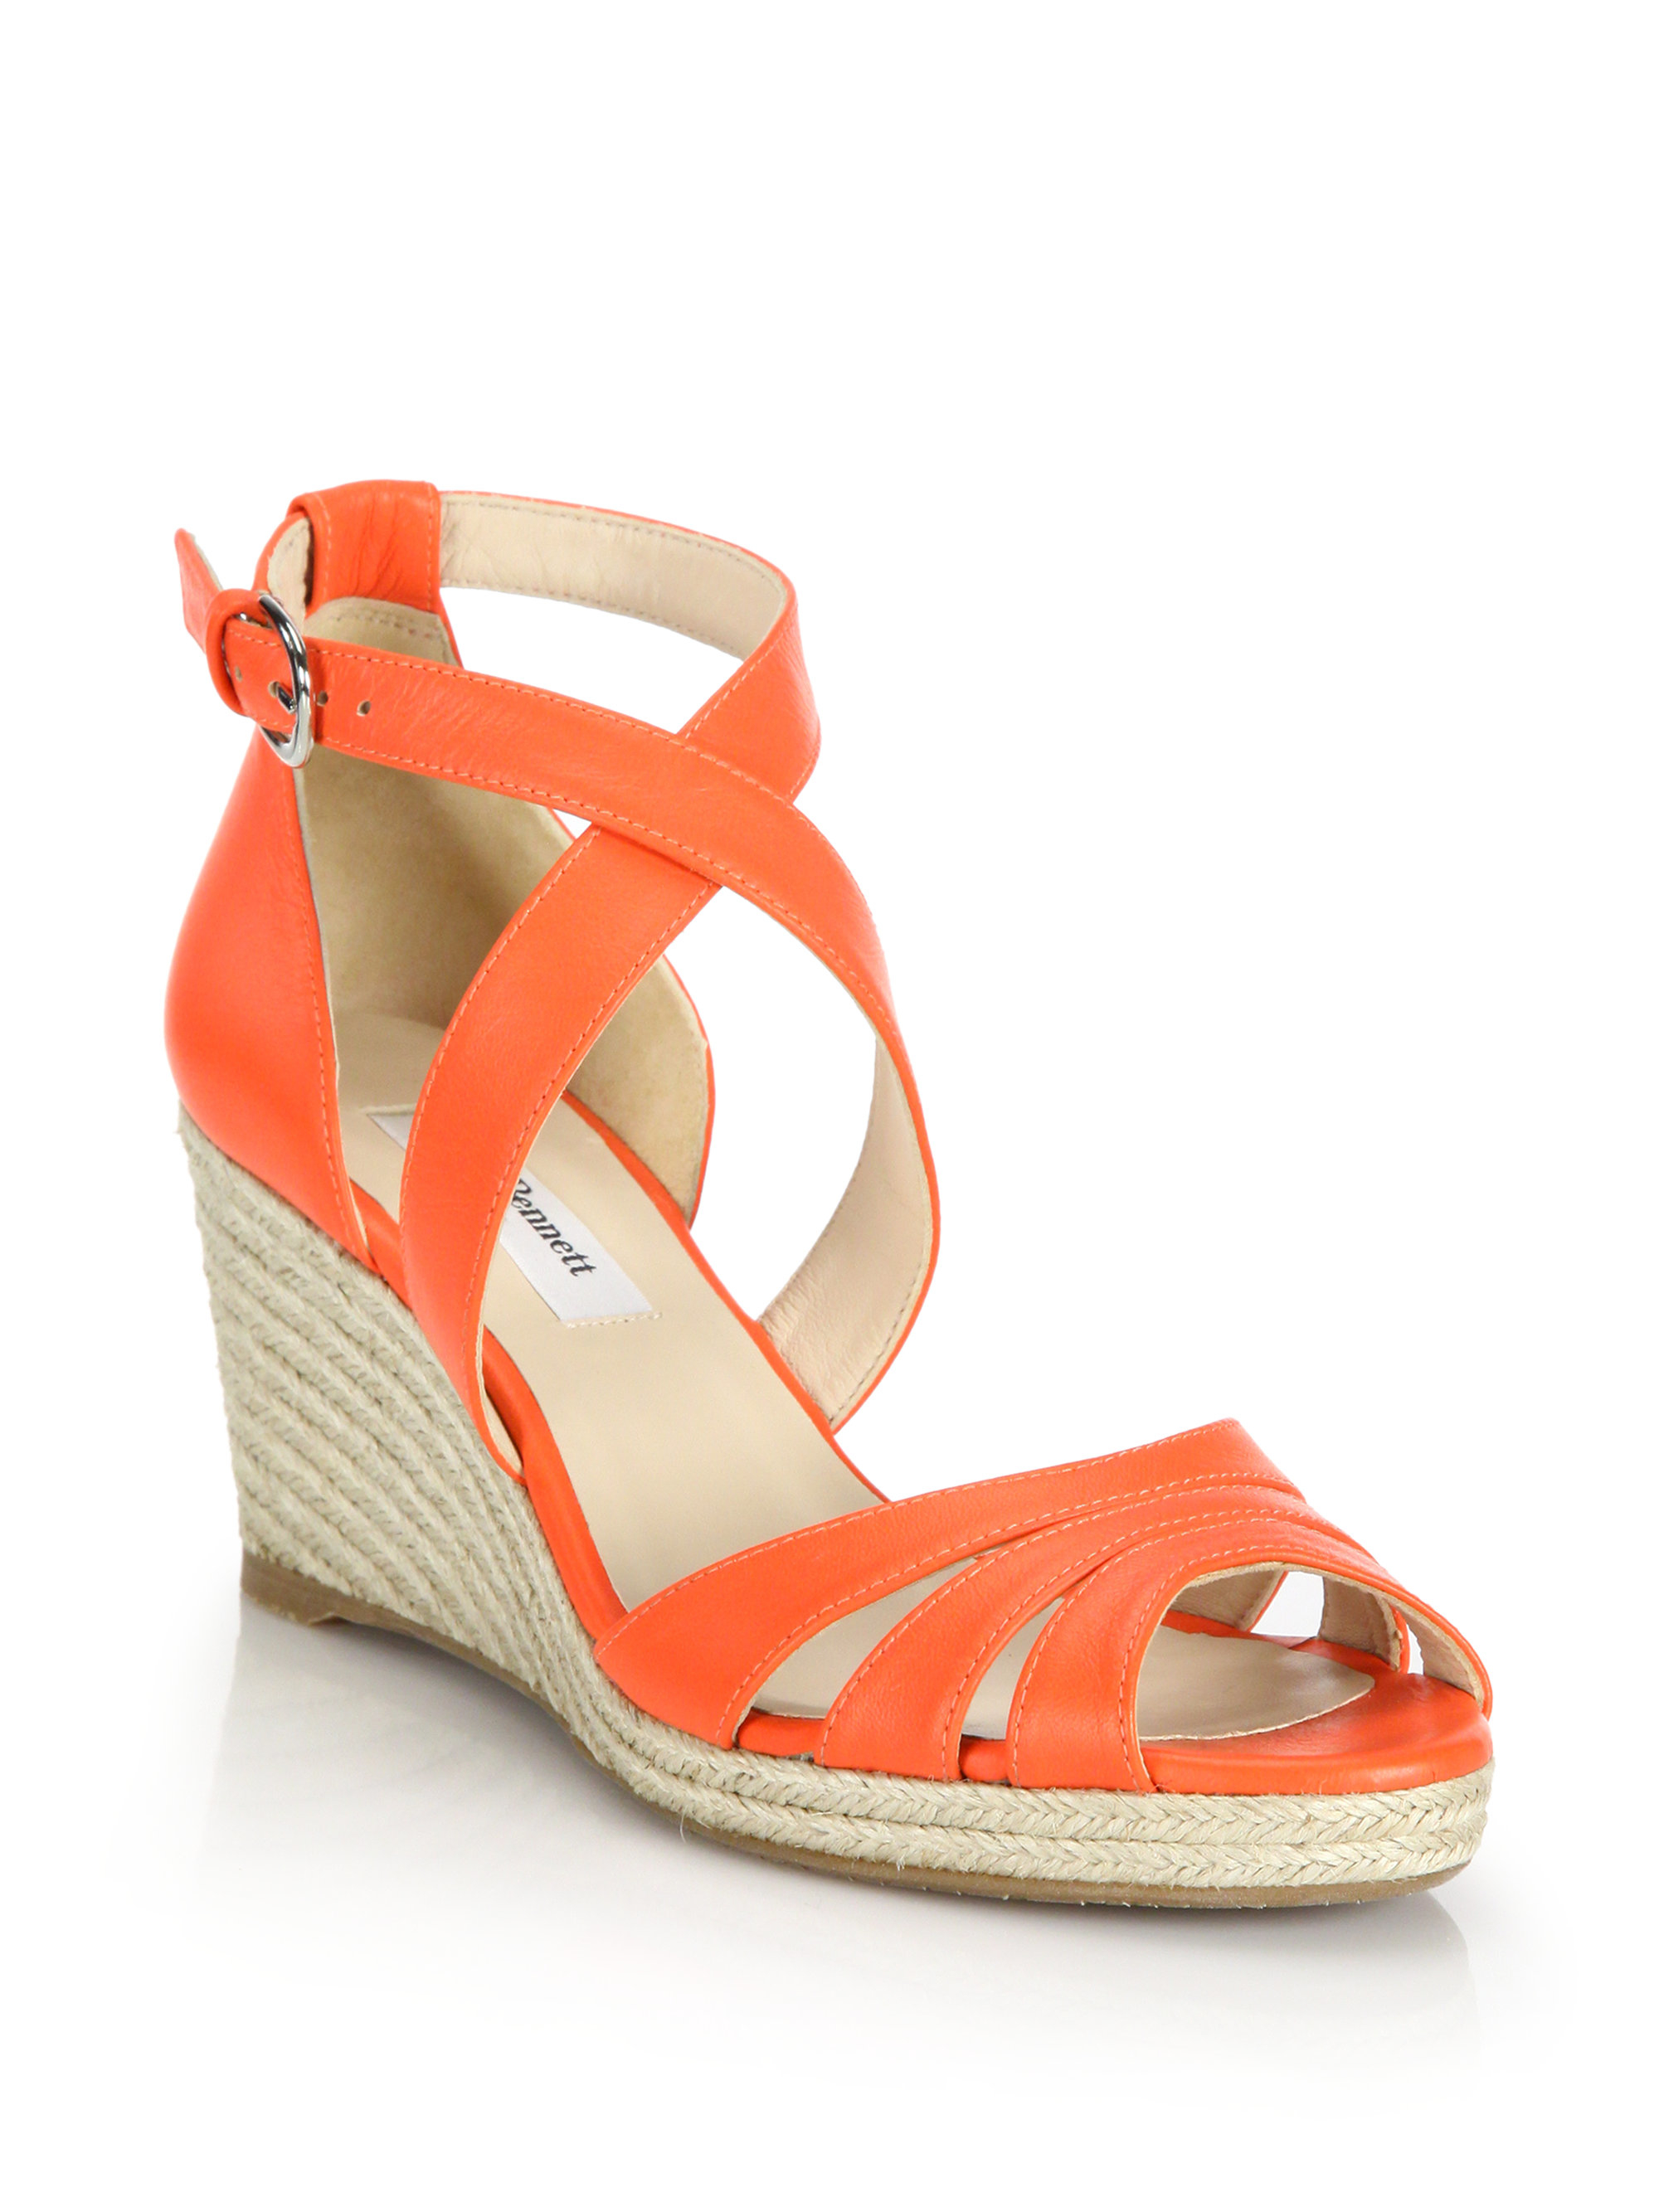 83b07d1f7e0 ... lyst l k bennett priya leather espadrille wedge sandals in orange   trendy orange color block ankle strap ...